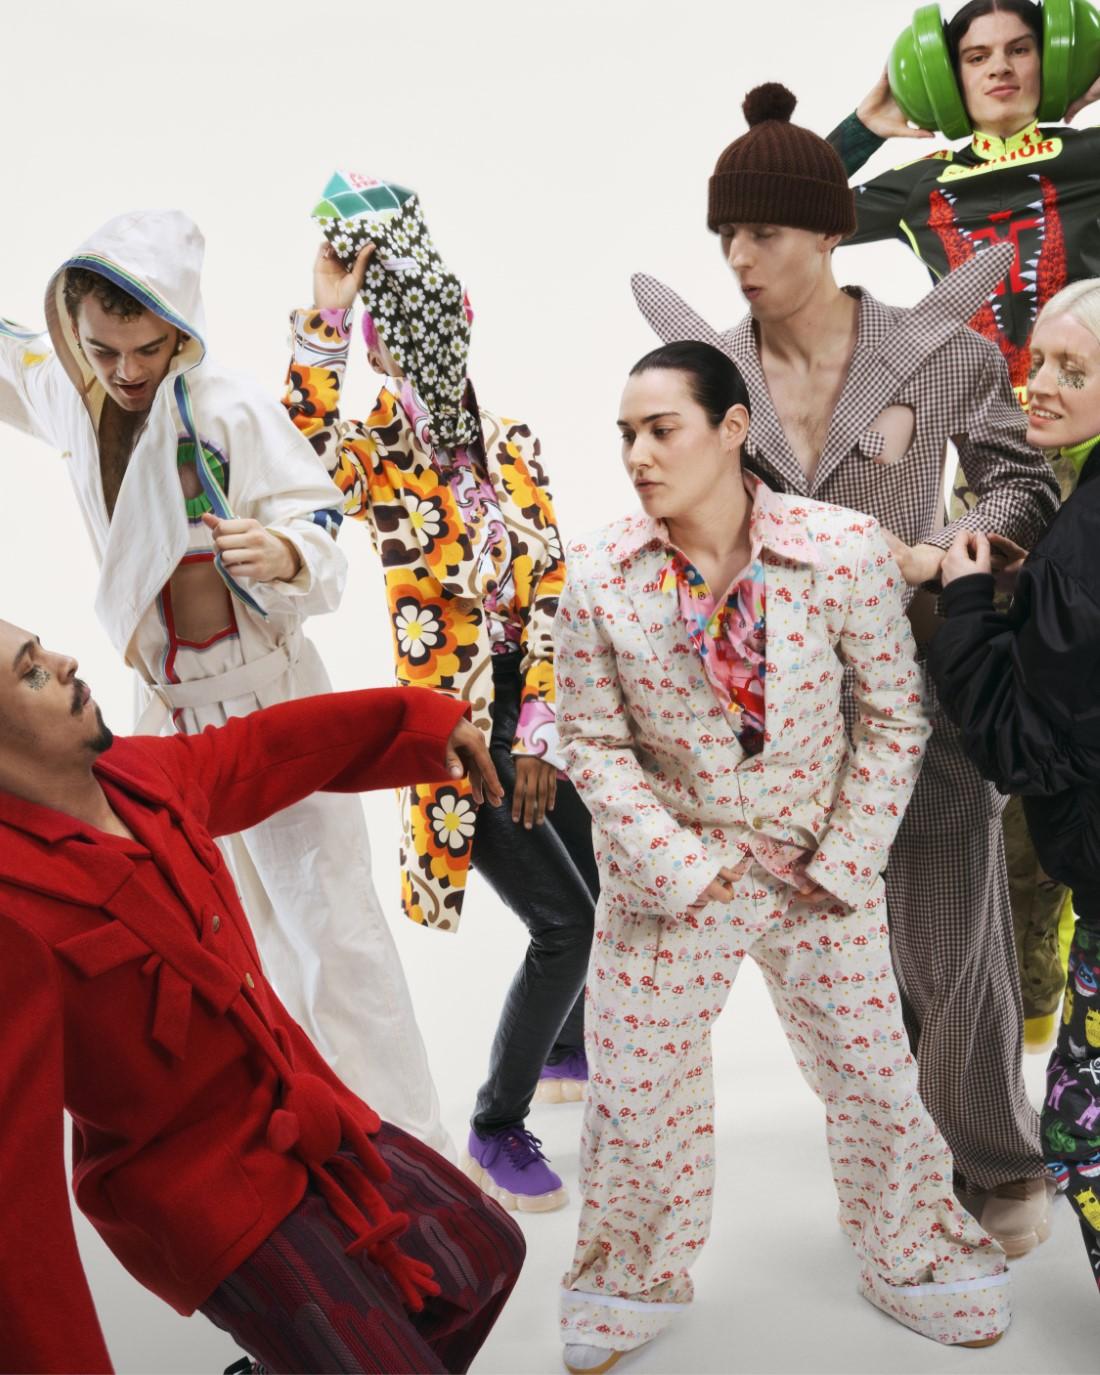 MoMu - Fashion 2.021 Antwerp - Fashion Conscious